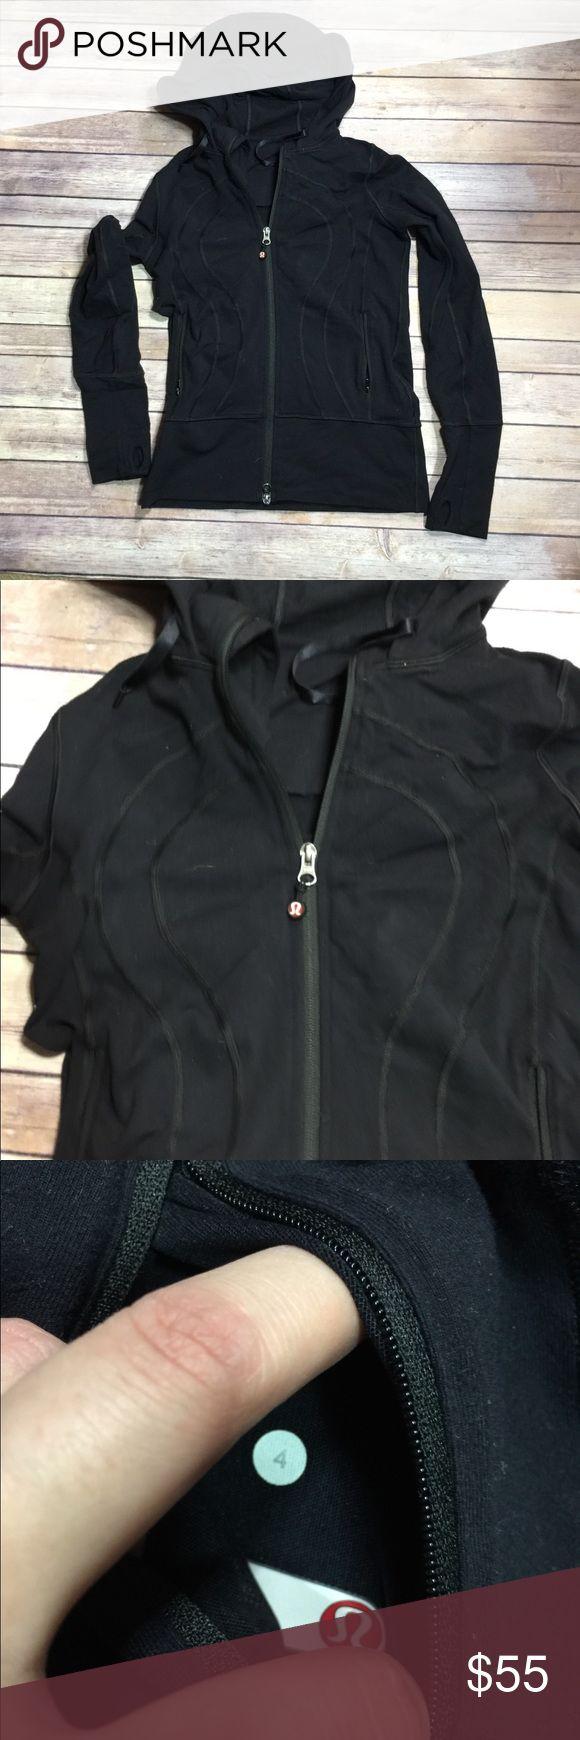 Lululemon Zip Up Hoodie Great condition slight metal scratch on zippers.  Still have size dot. lululemon athletica Tops Sweatshirts & Hoodies